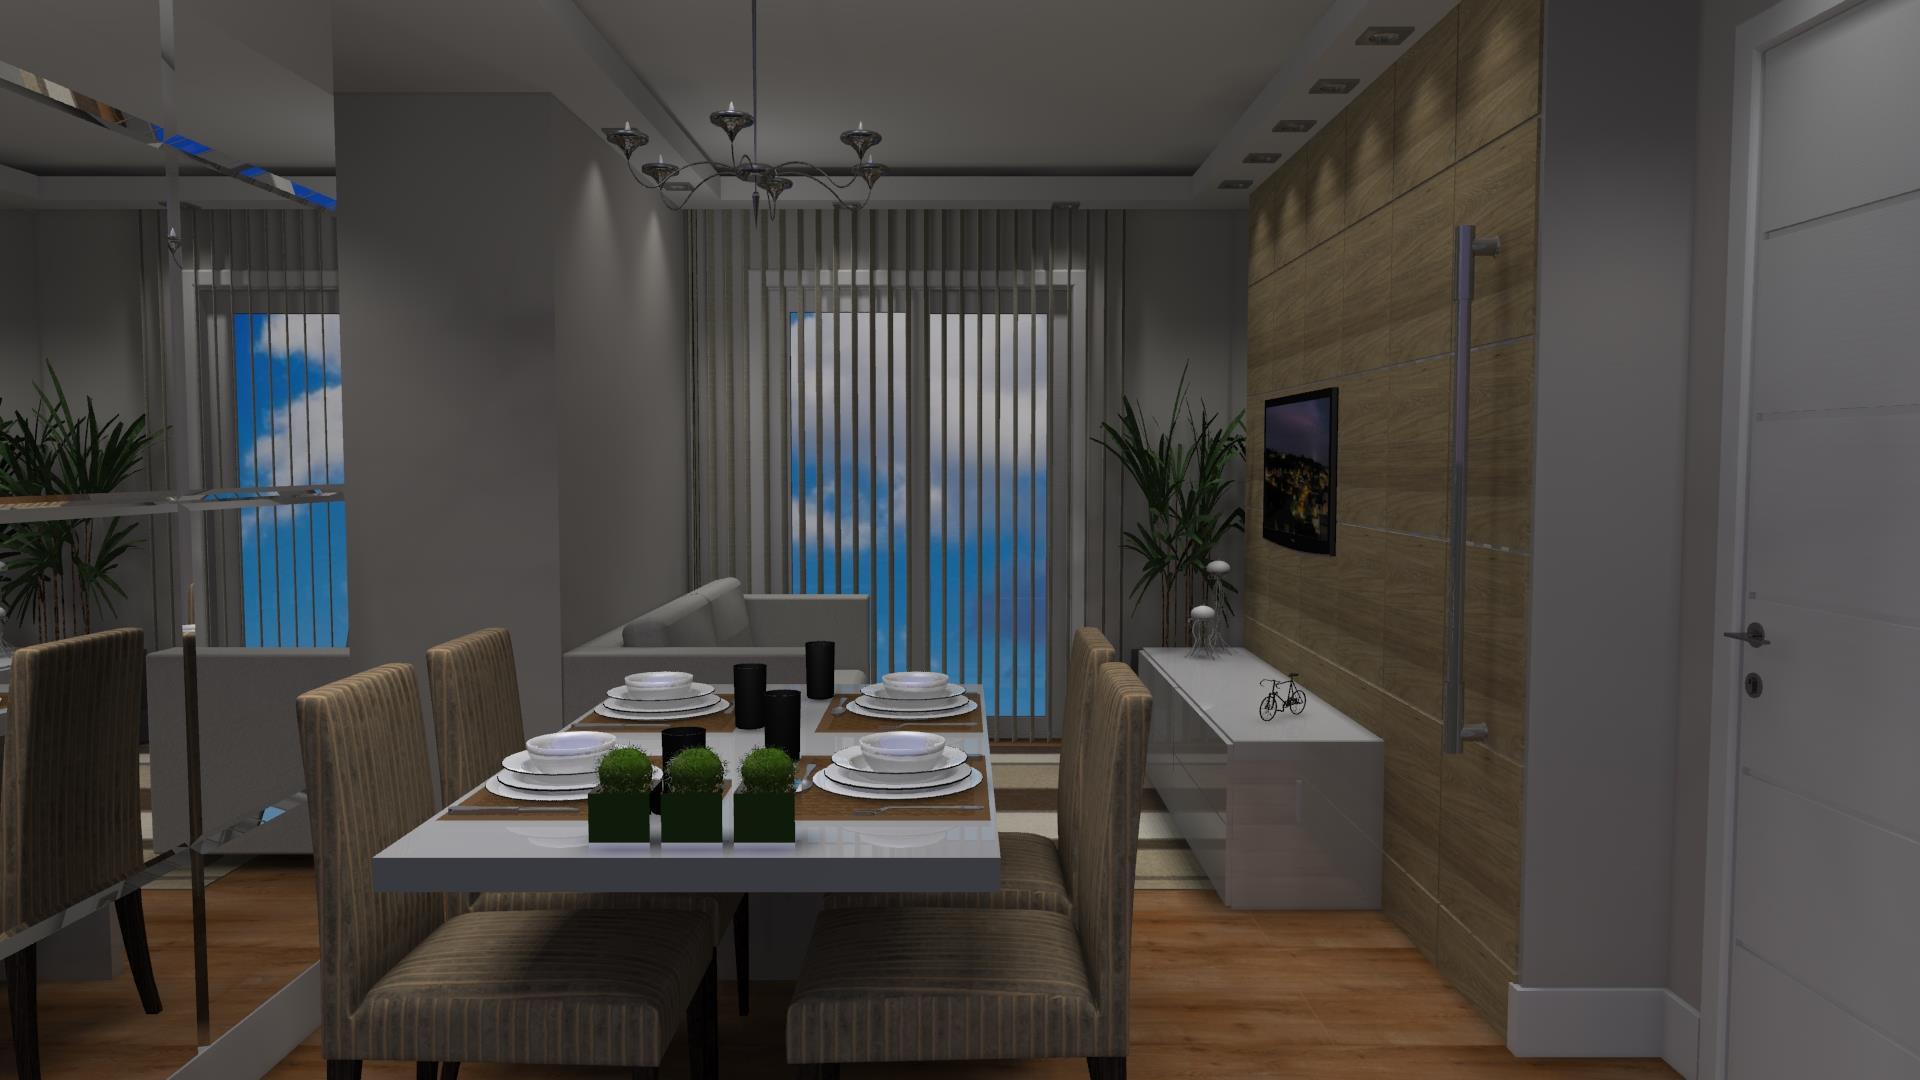 decoracao-de-sala-de-jantar